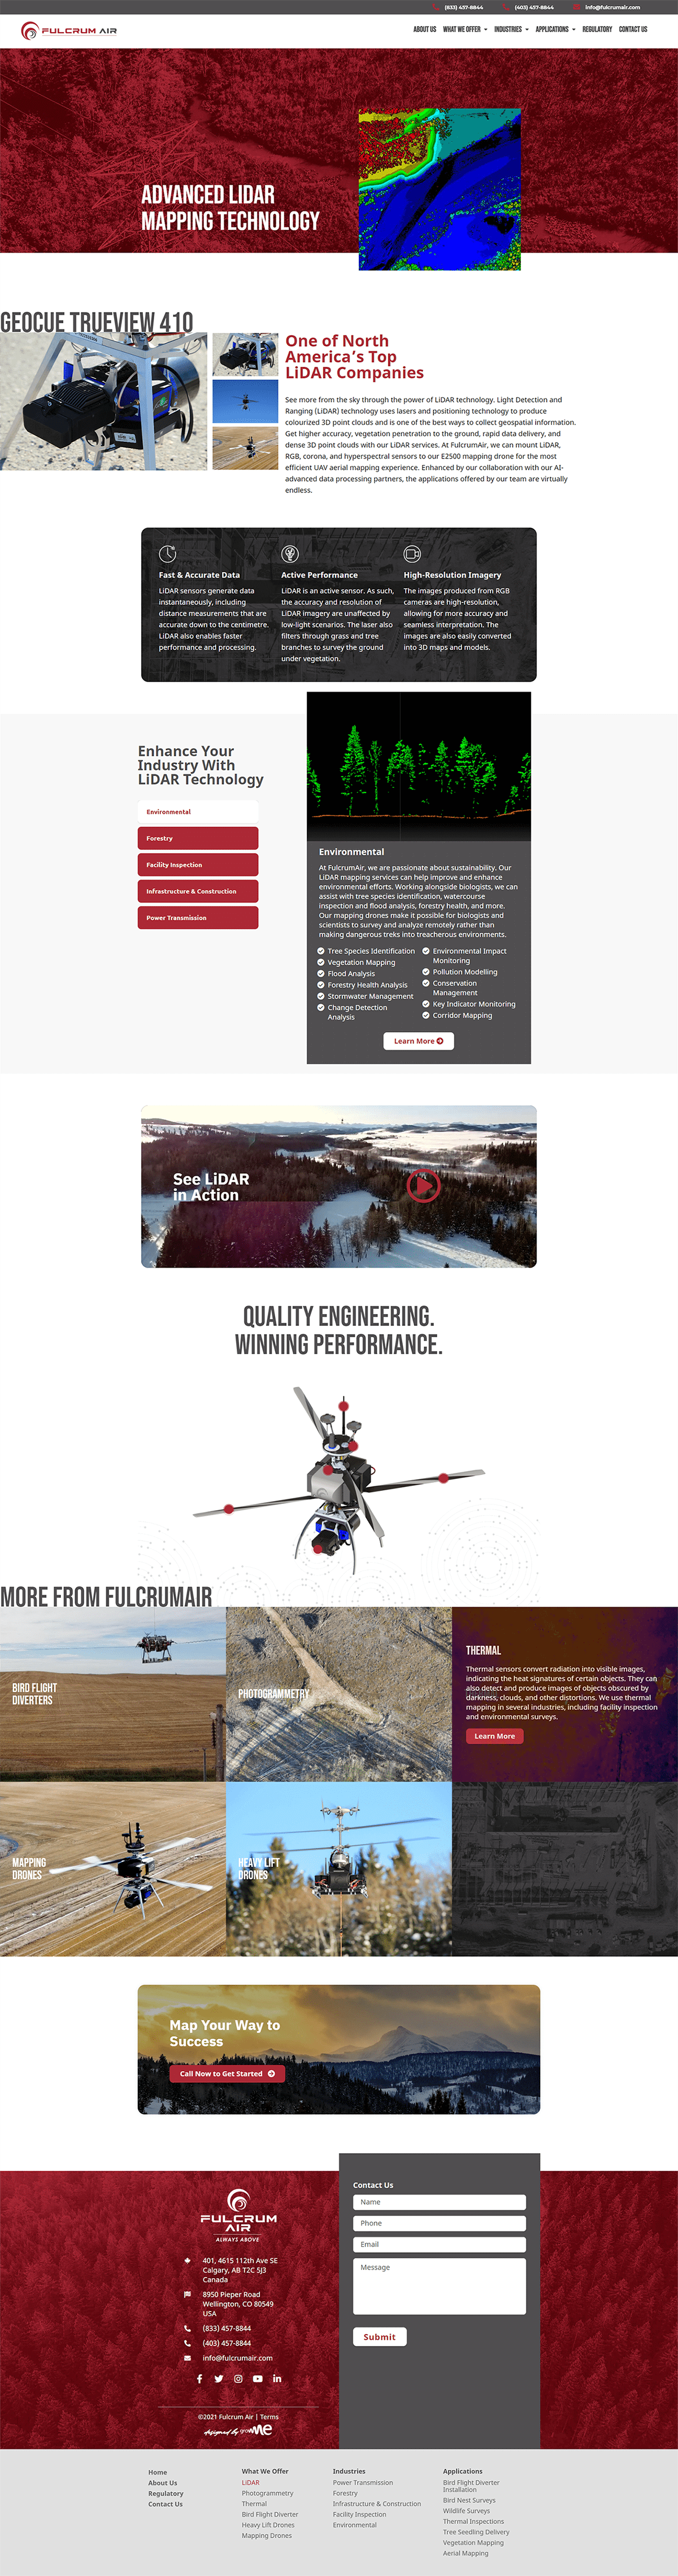 fulcrum air service